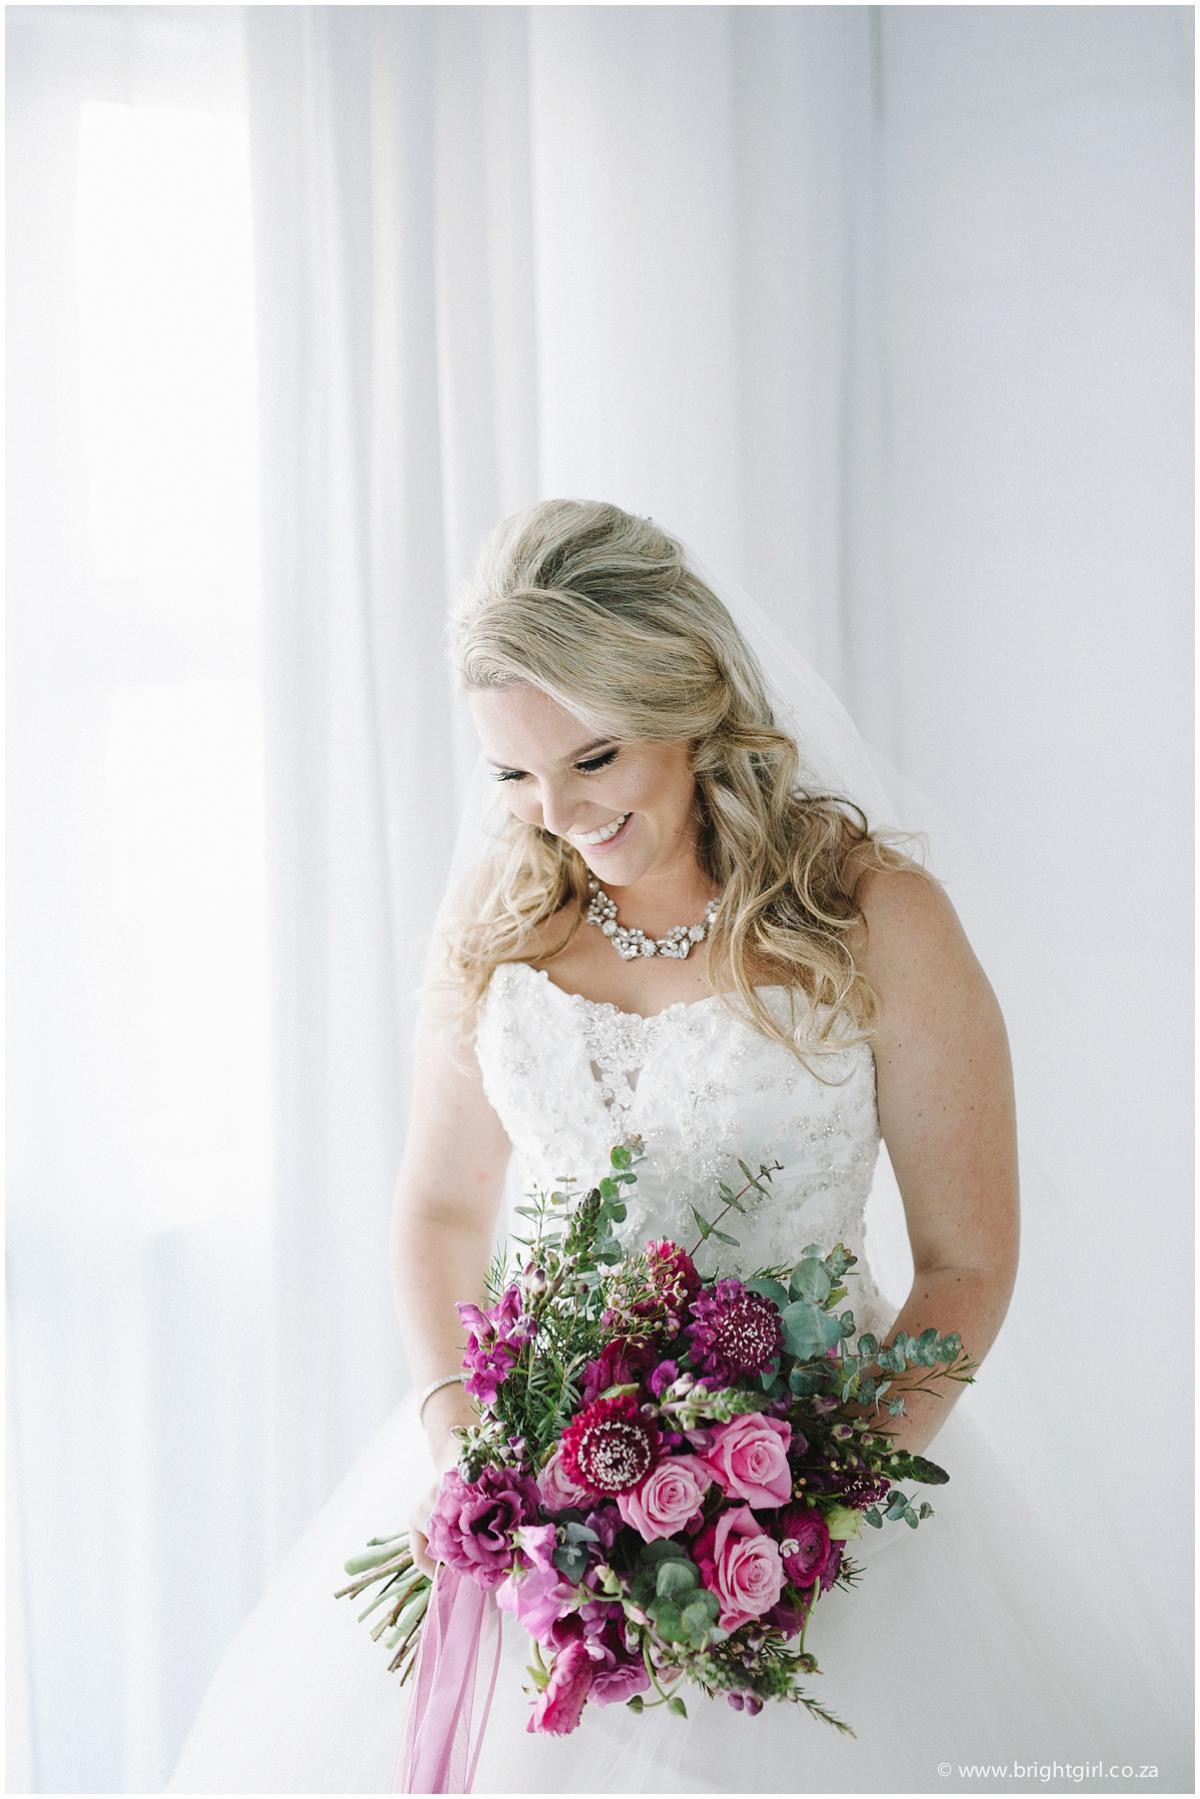 talloula-wedding-tarryn-chris-18